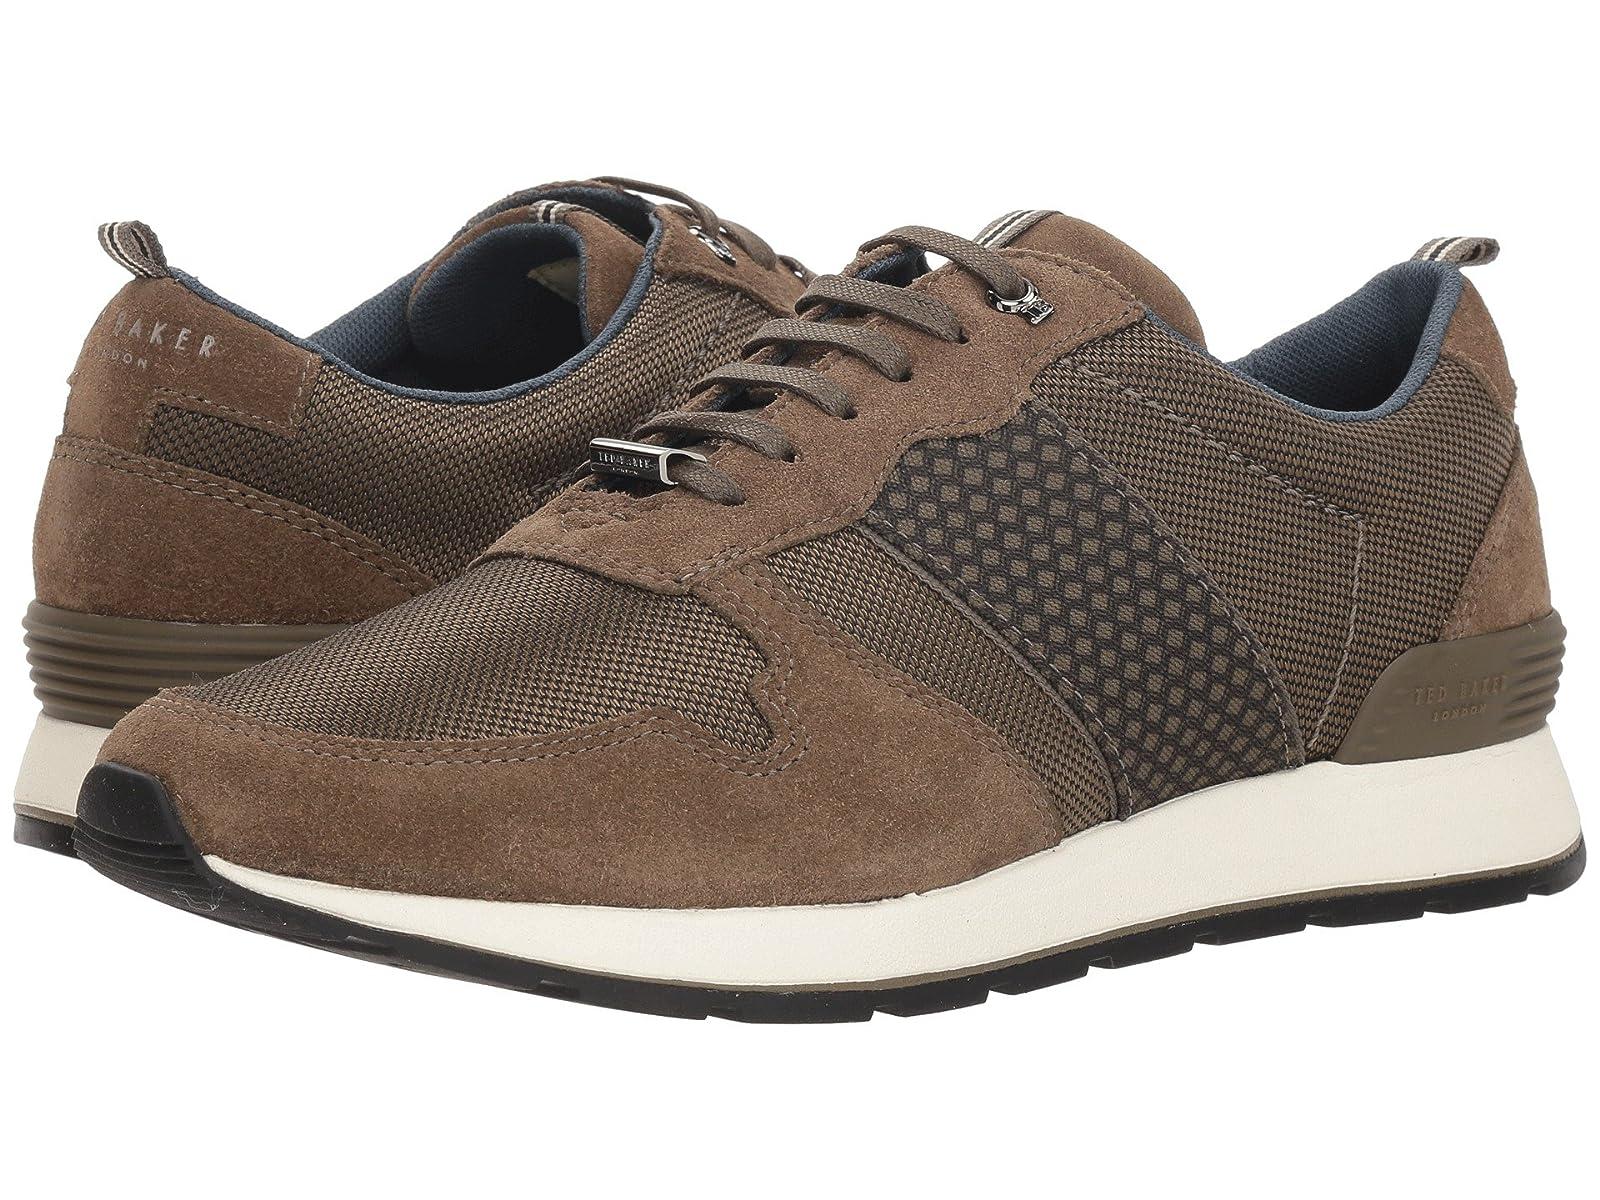 Ted Baker HebeyAtmospheric grades have affordable shoes